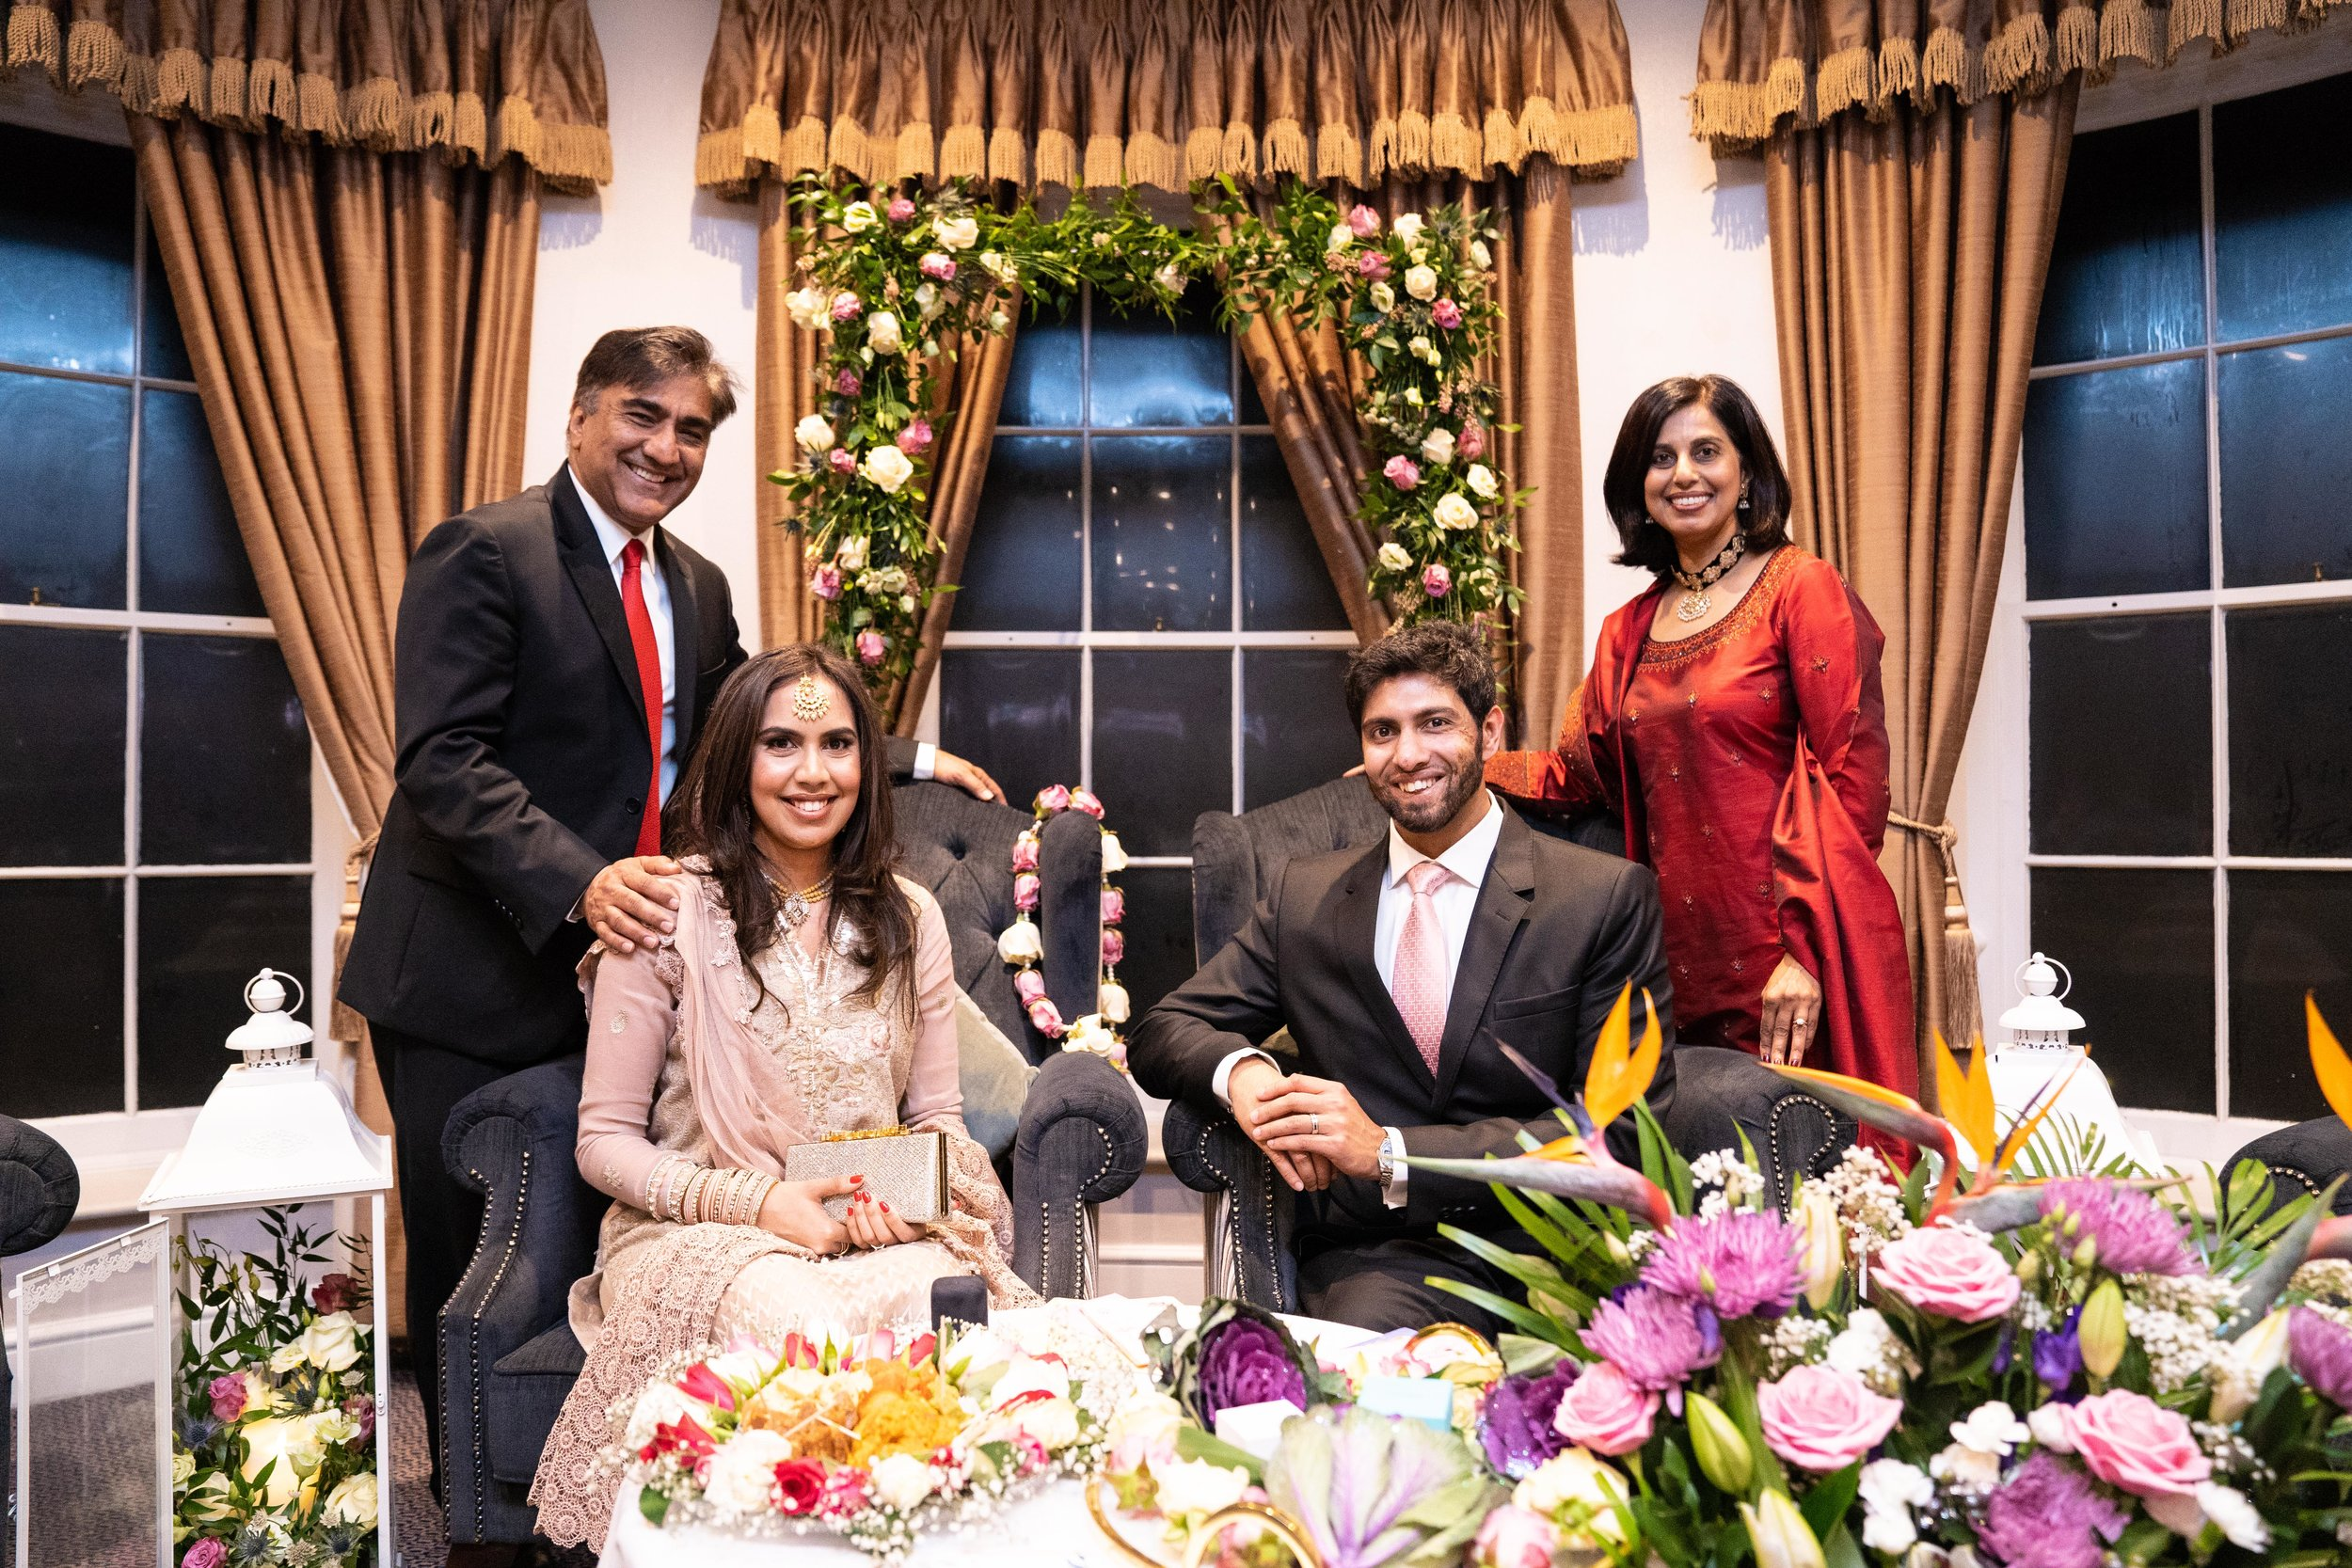 buckinghamshire-golf-club-winter-muslim-wedding-engagement-photography-videography-33